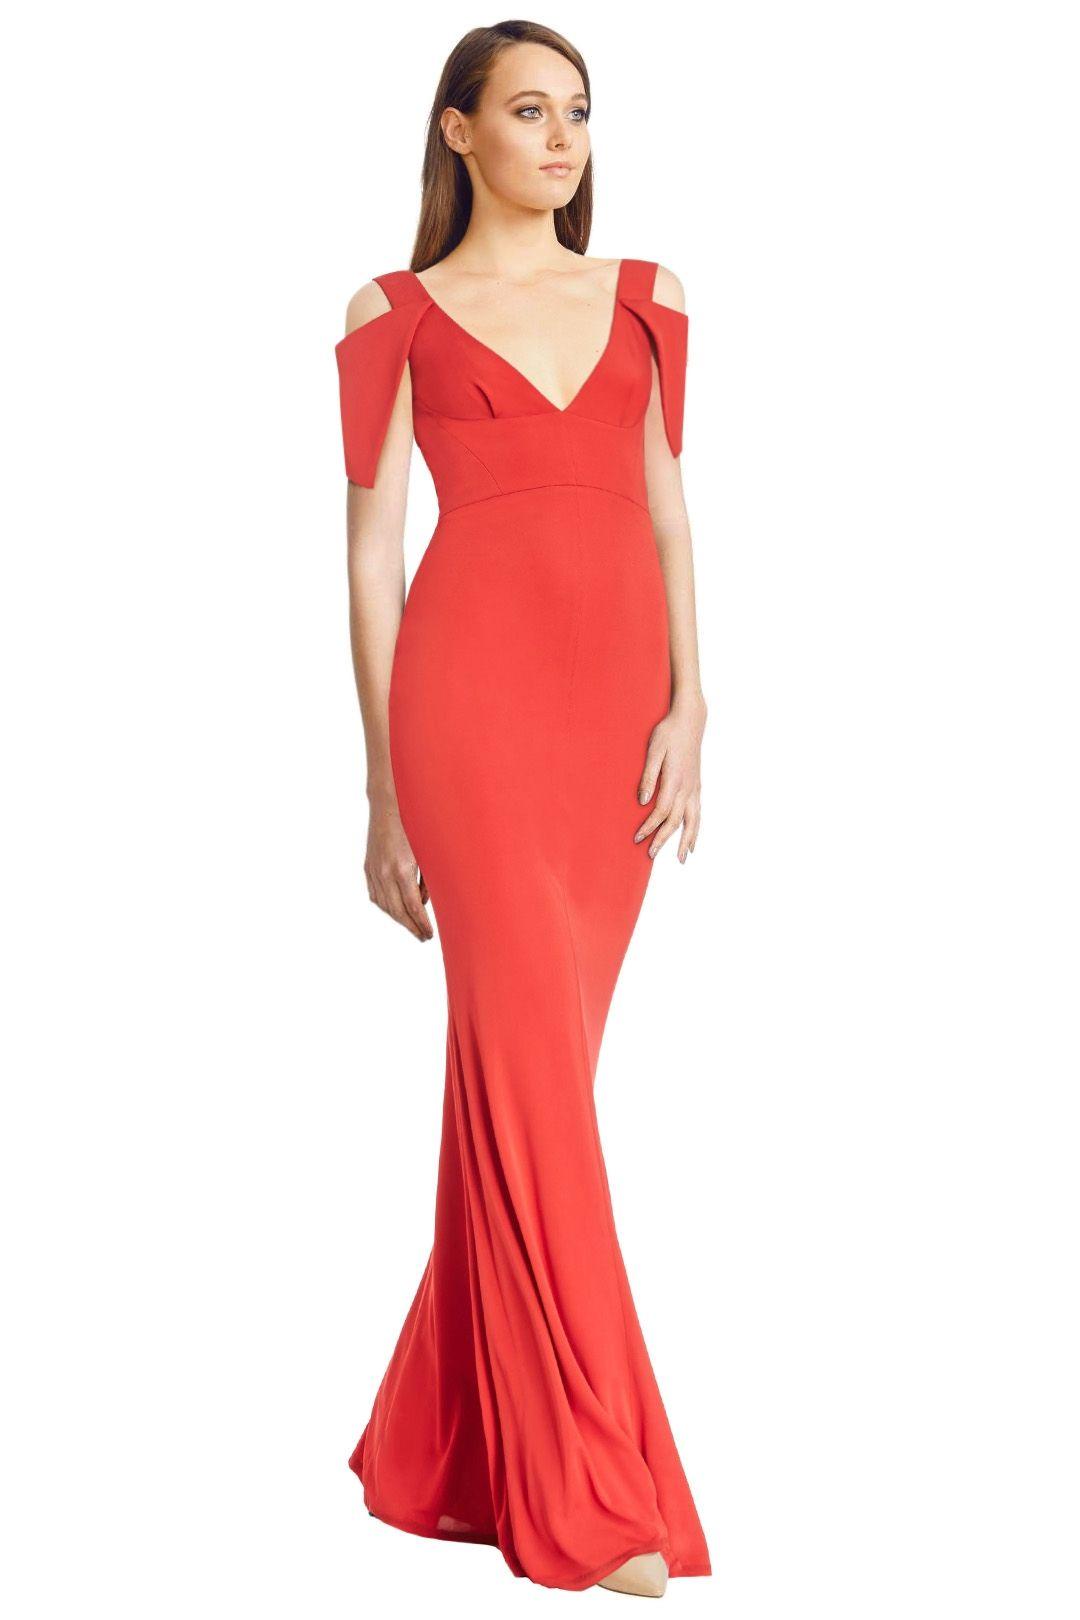 ABS by Allen Schwartz - Triangle Sleeve Deep V Neck Gown - Poppy Red - Side